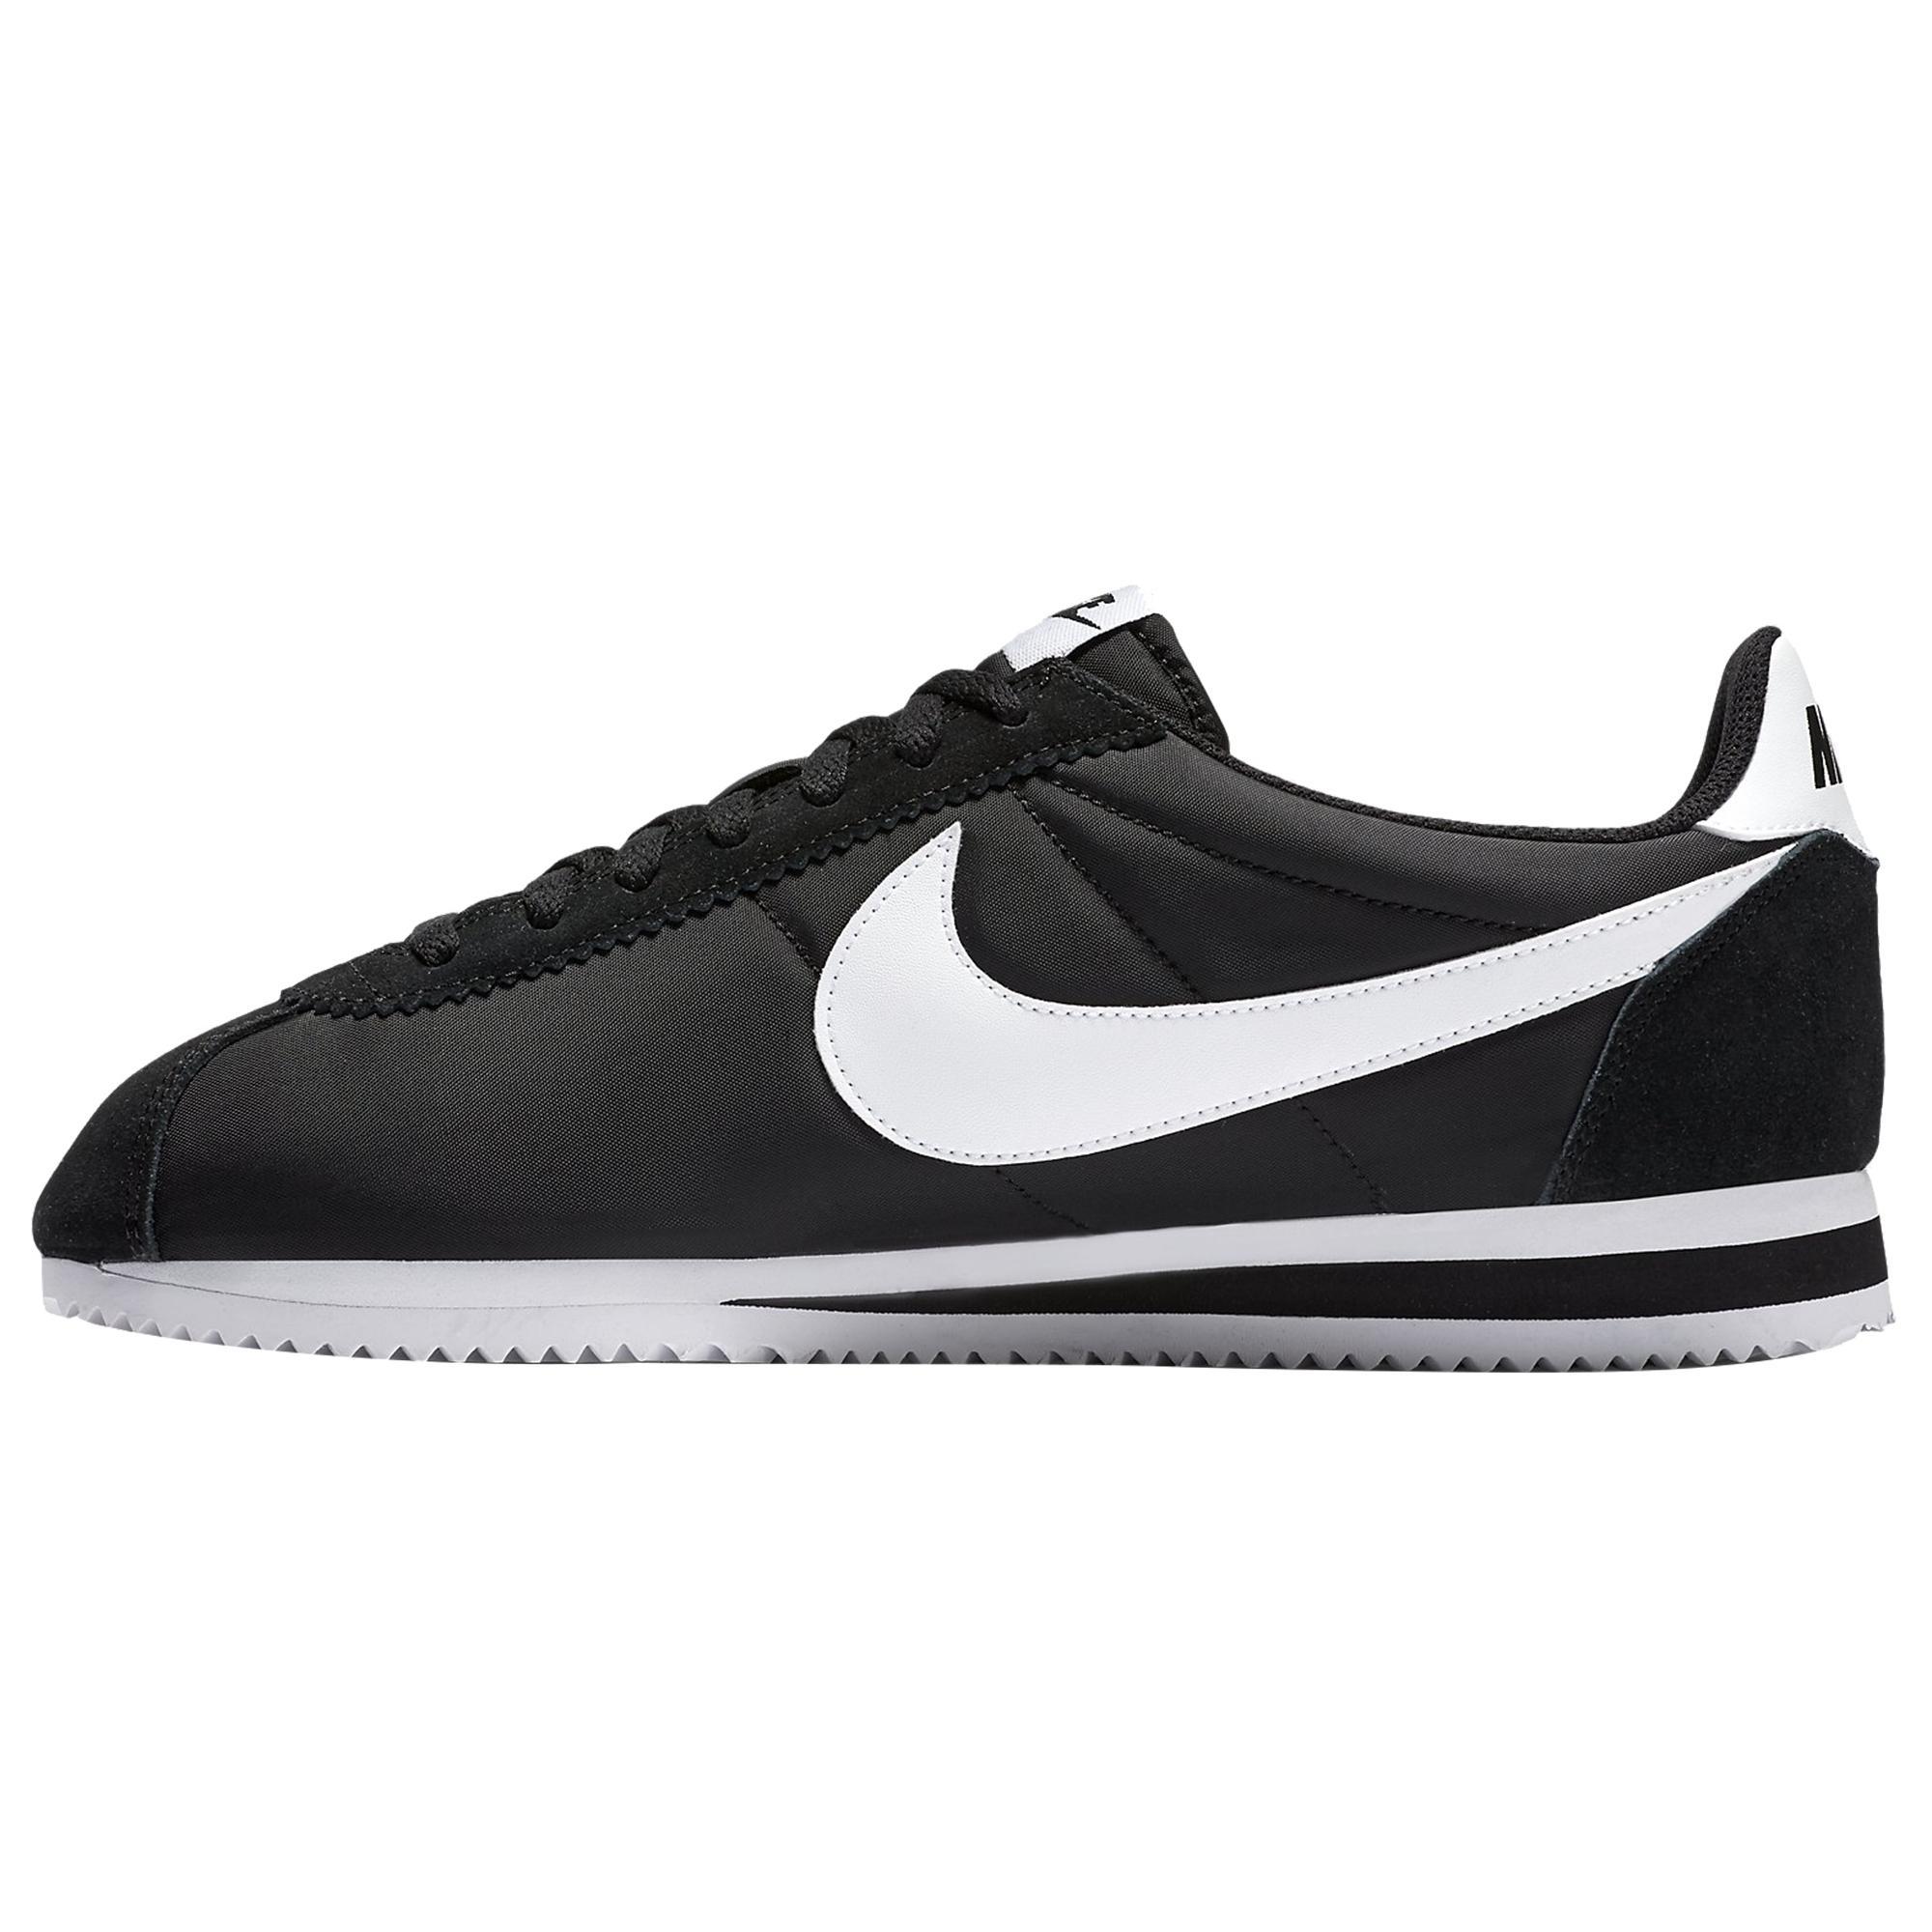 Radioactivo Acrobacia Bailarín  Men's Trainers Nike Classic Cortez Nylon Men's Shoes 532487 018 cbaplan.com